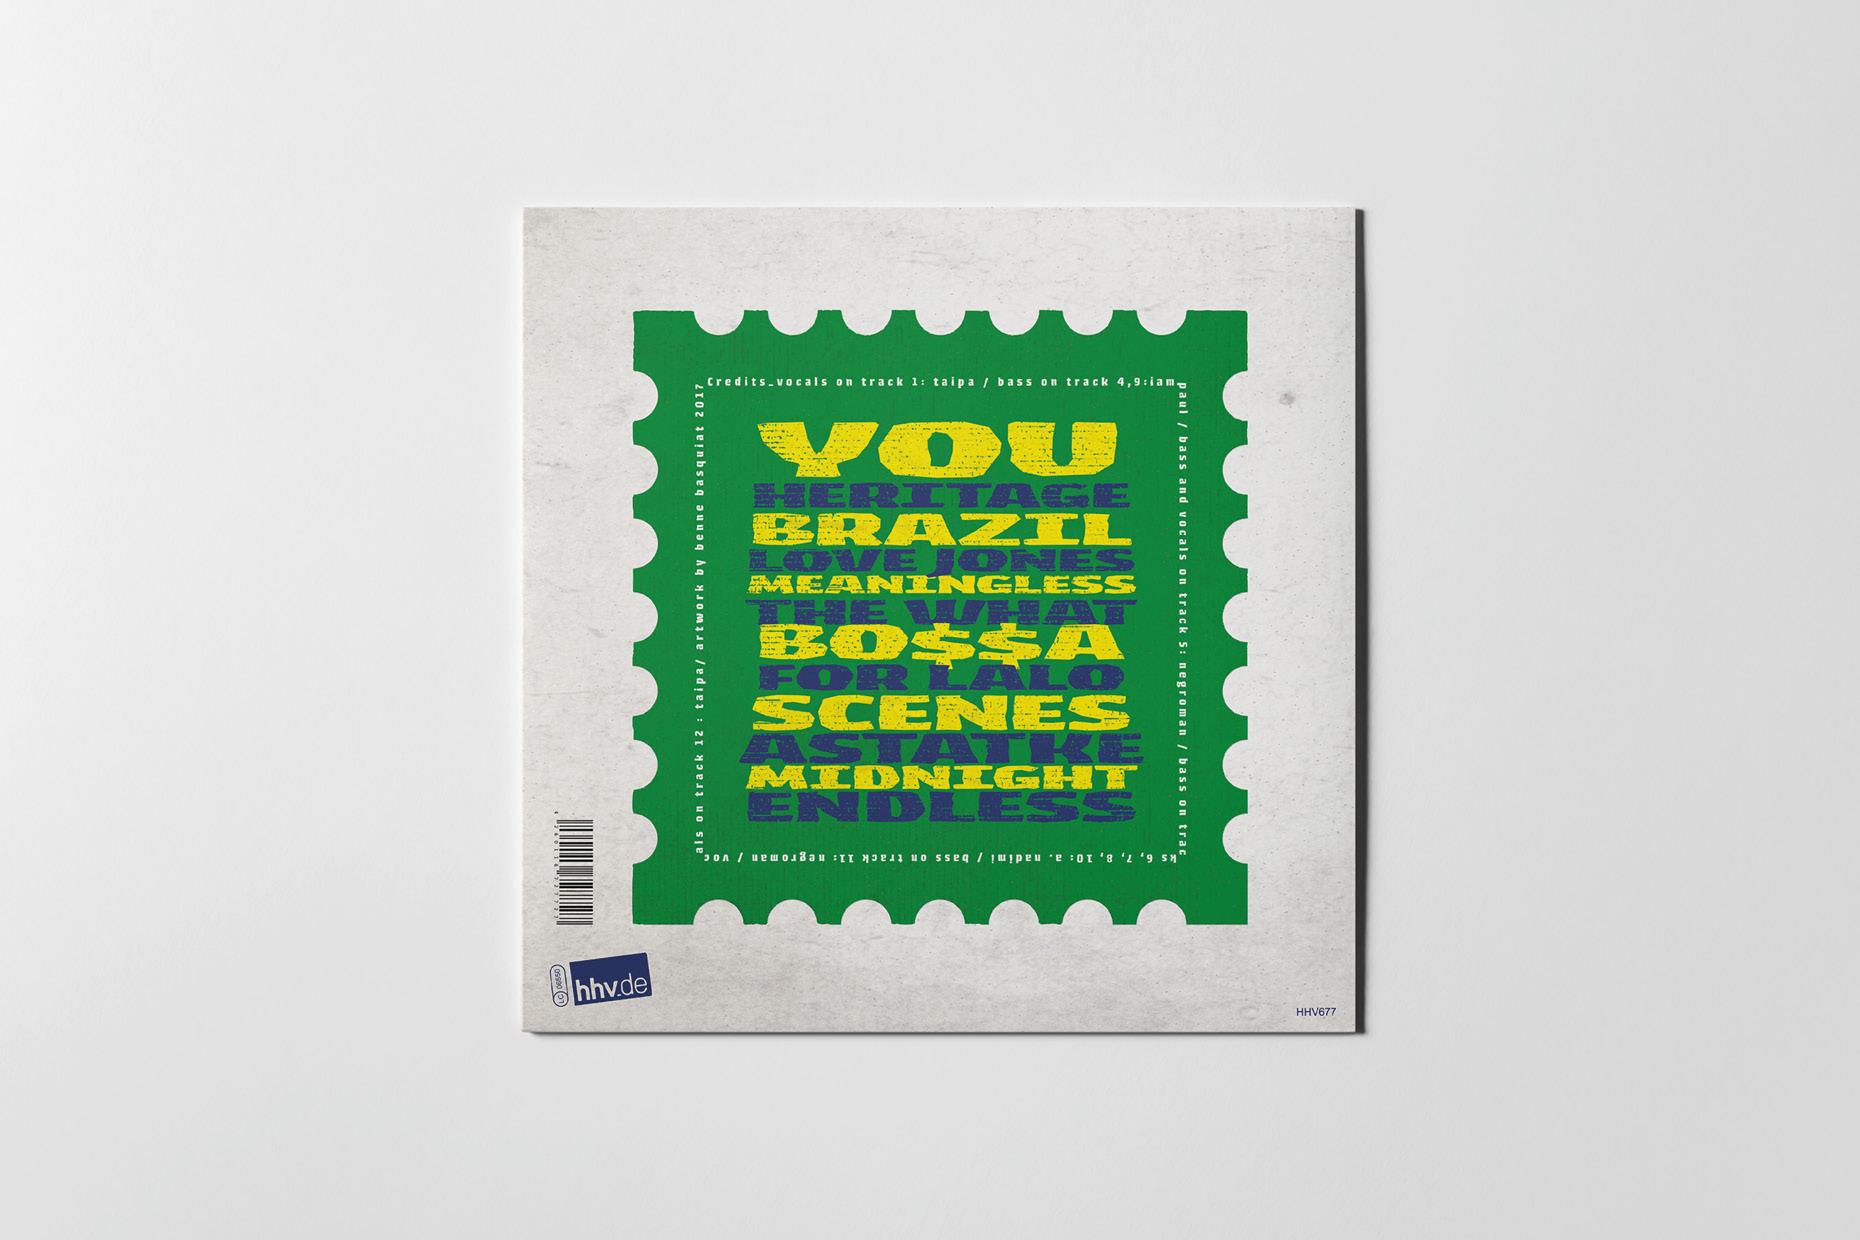 Vinyl_Archiv_201817.jpg